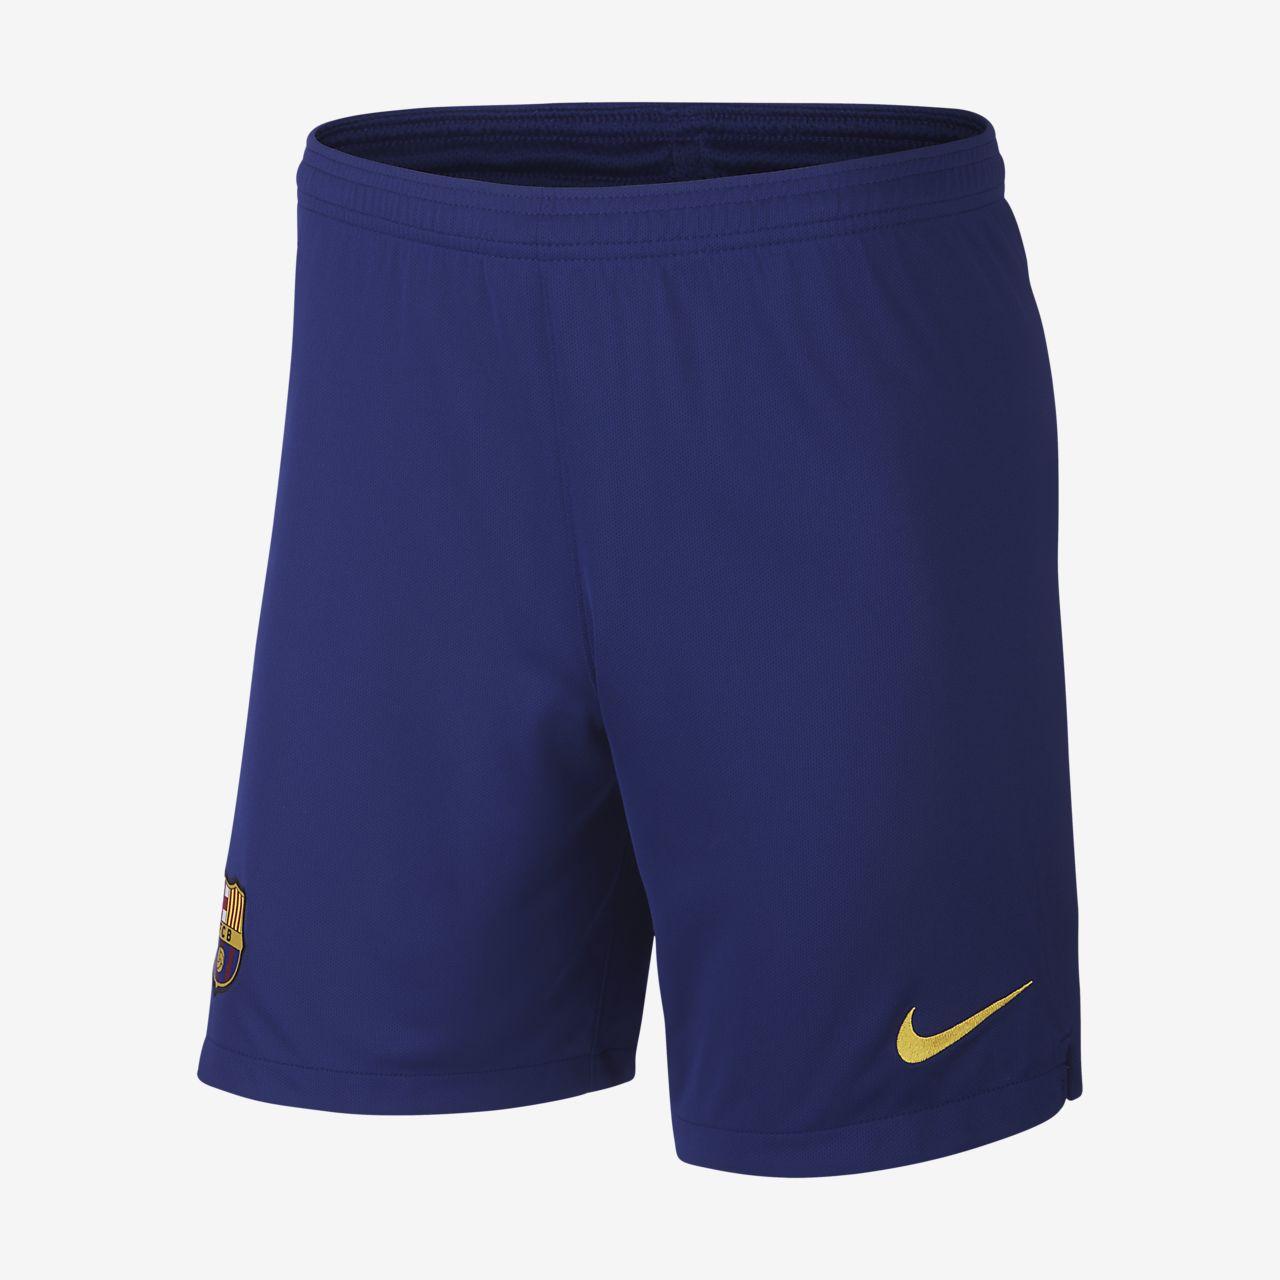 FC Barcelona 2019/20 Stadium Home/Away Men's Football Shorts